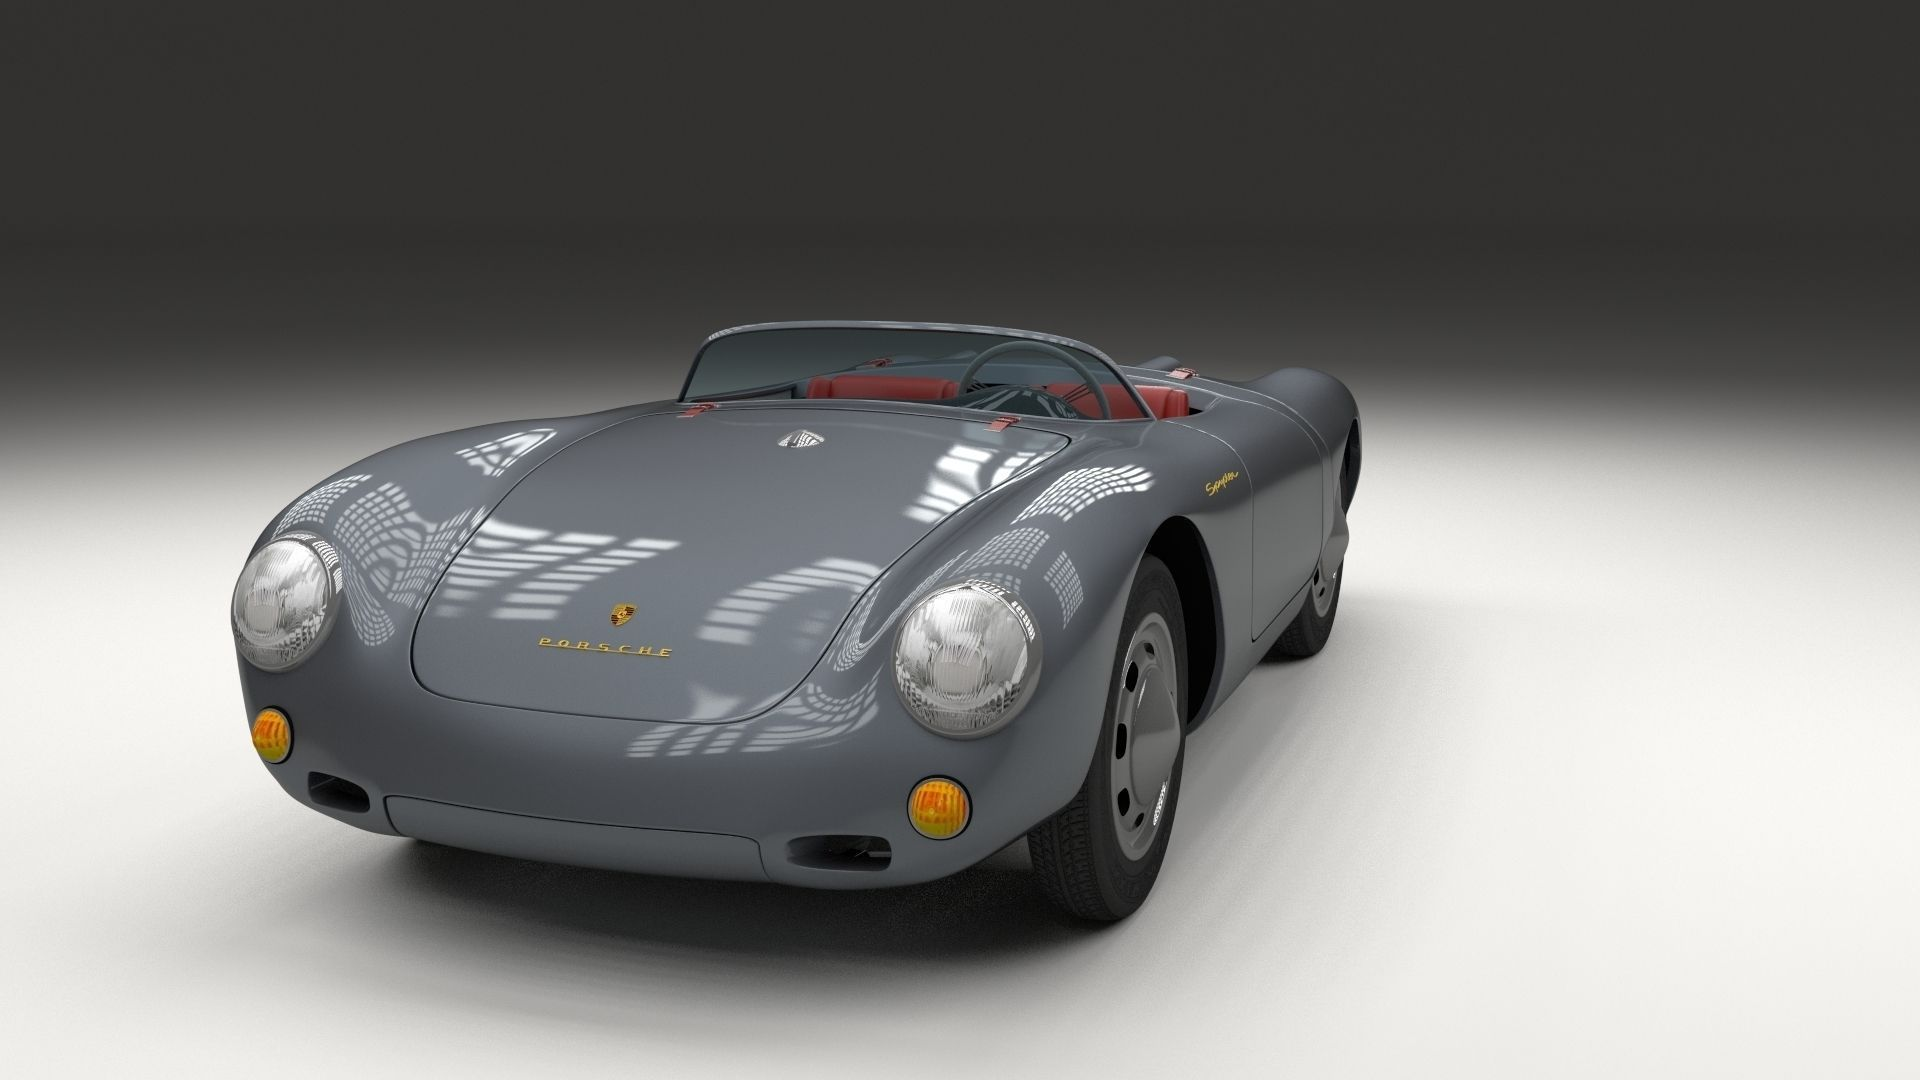 Porsche 550 Spyder Gray 3d Model Obj Stl Blend Dae